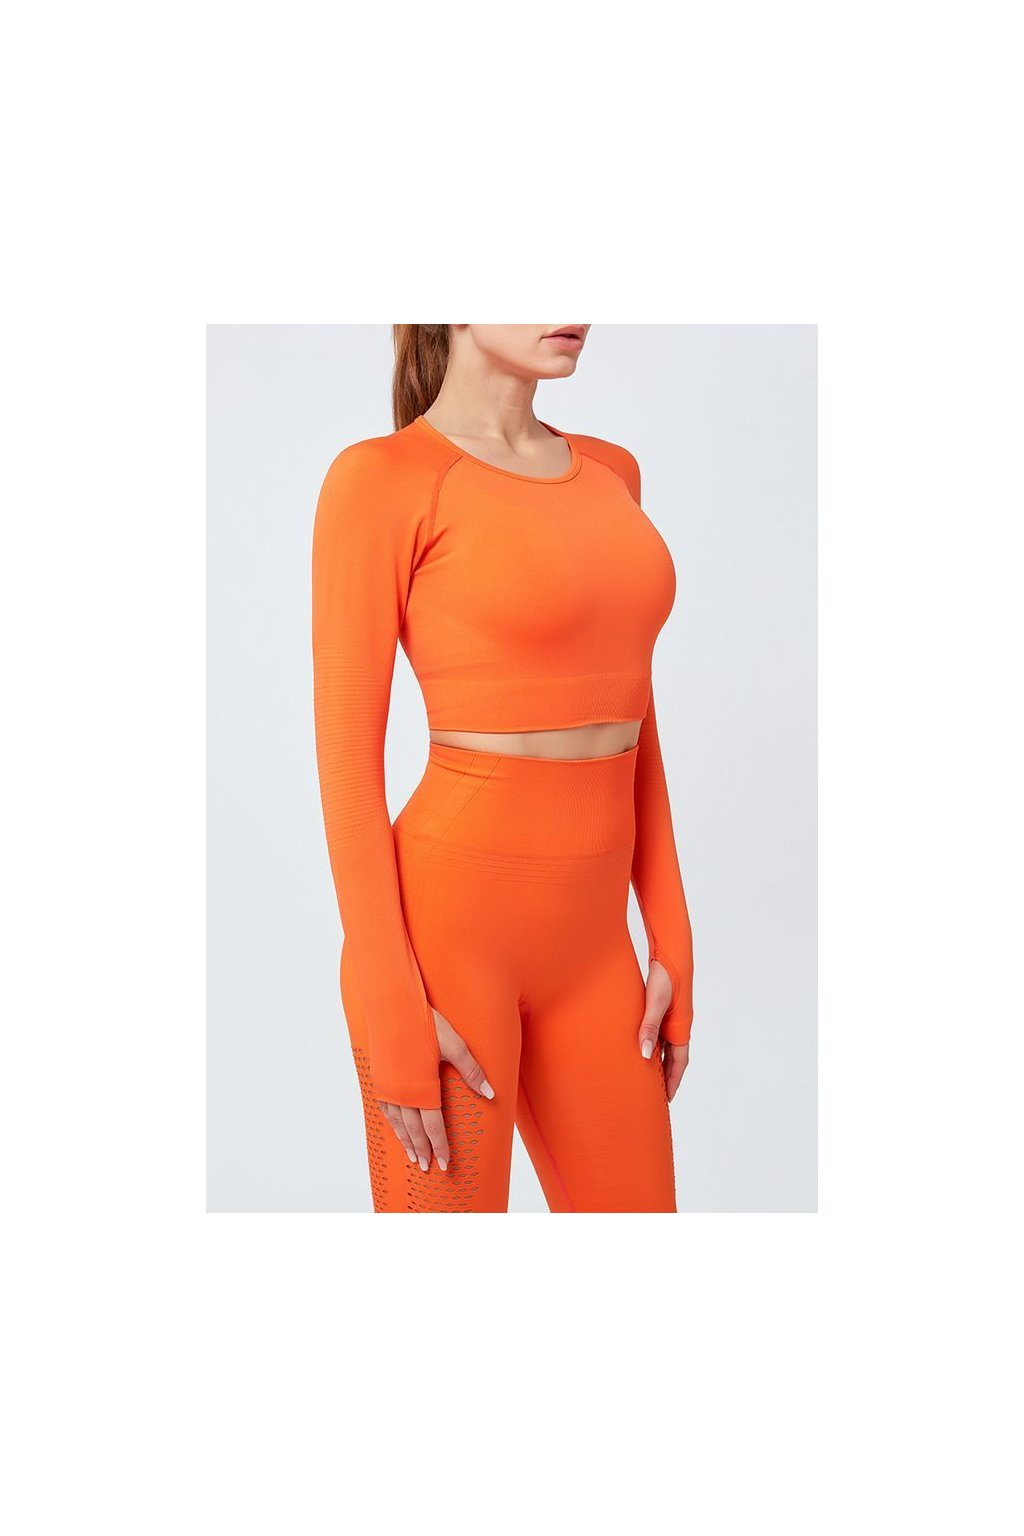 Dámský top Seamless Support Orange